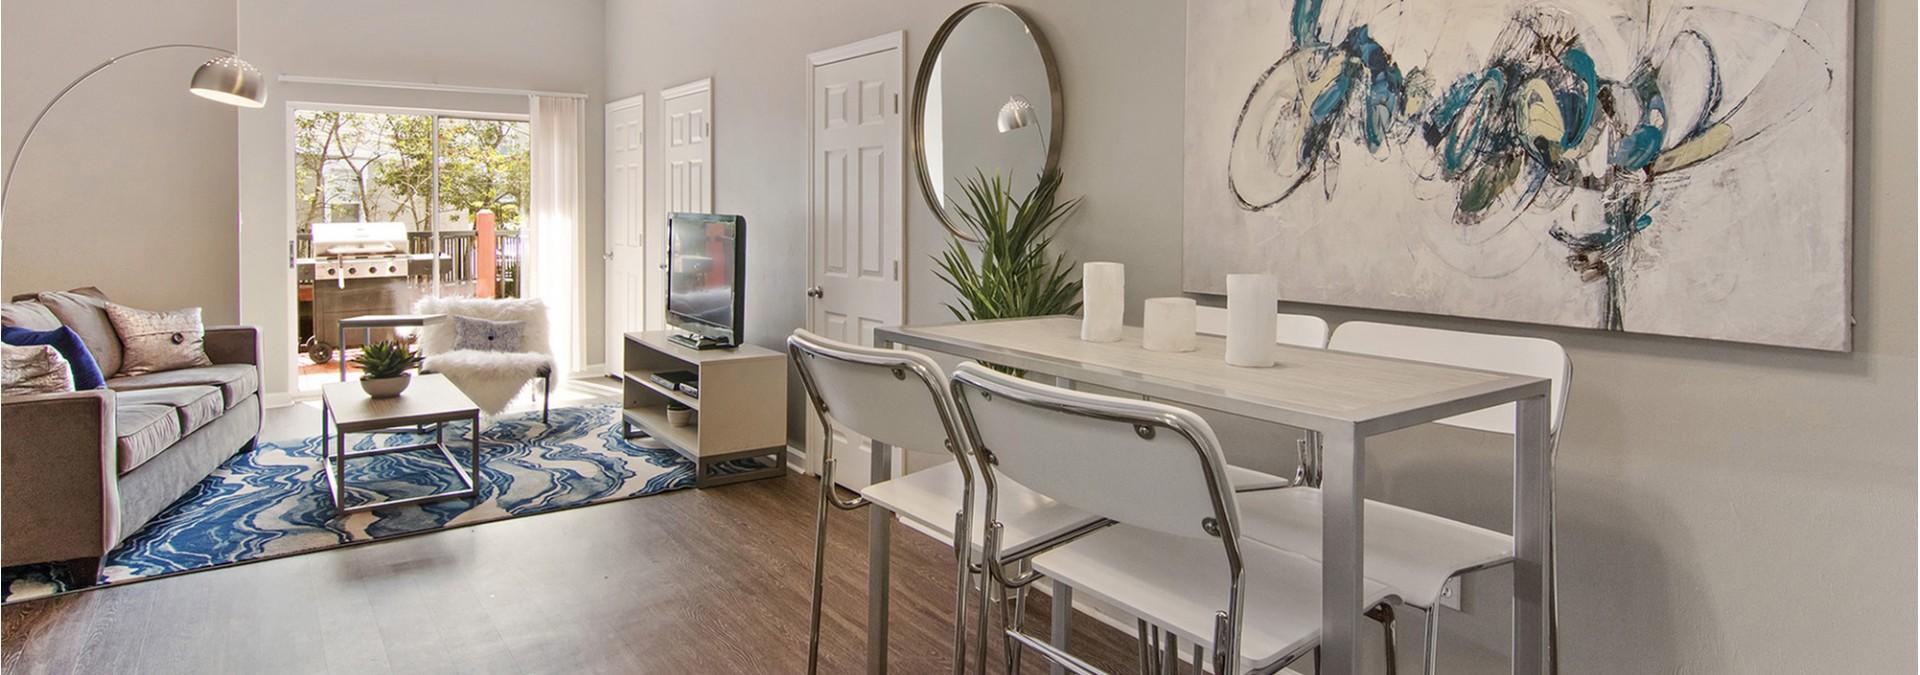 Elegant Master Bedroom | Luxury Apartments Tallahassee Near FSU | The Venetian Student Living